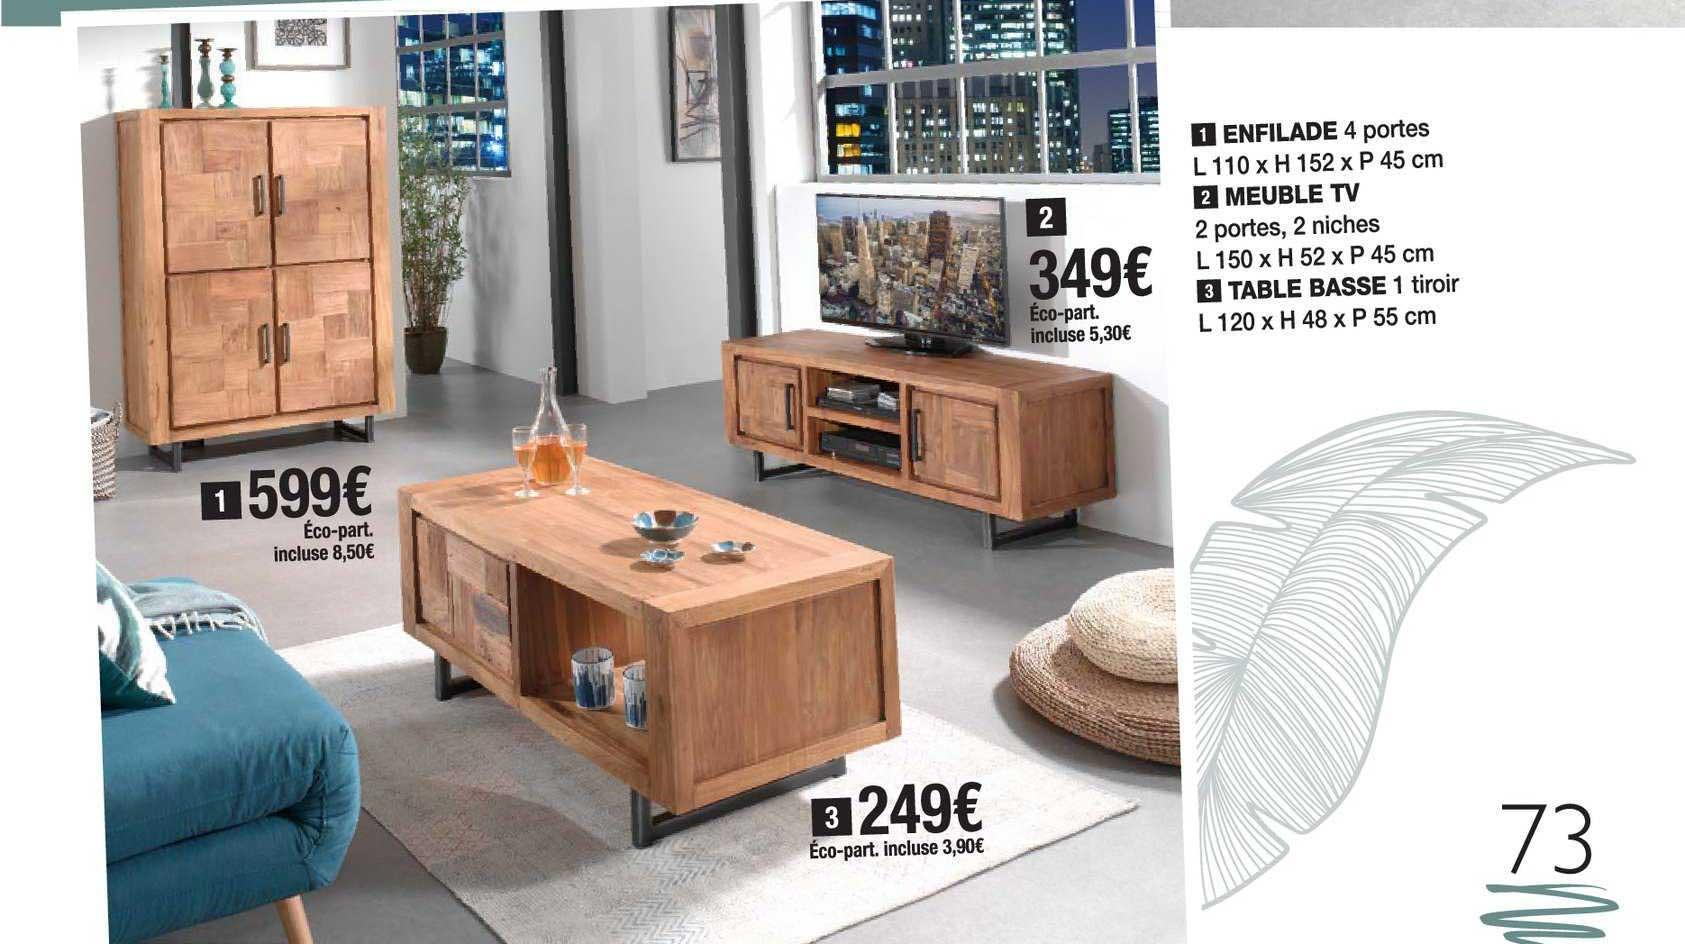 offre enfilade meuble tv table basse